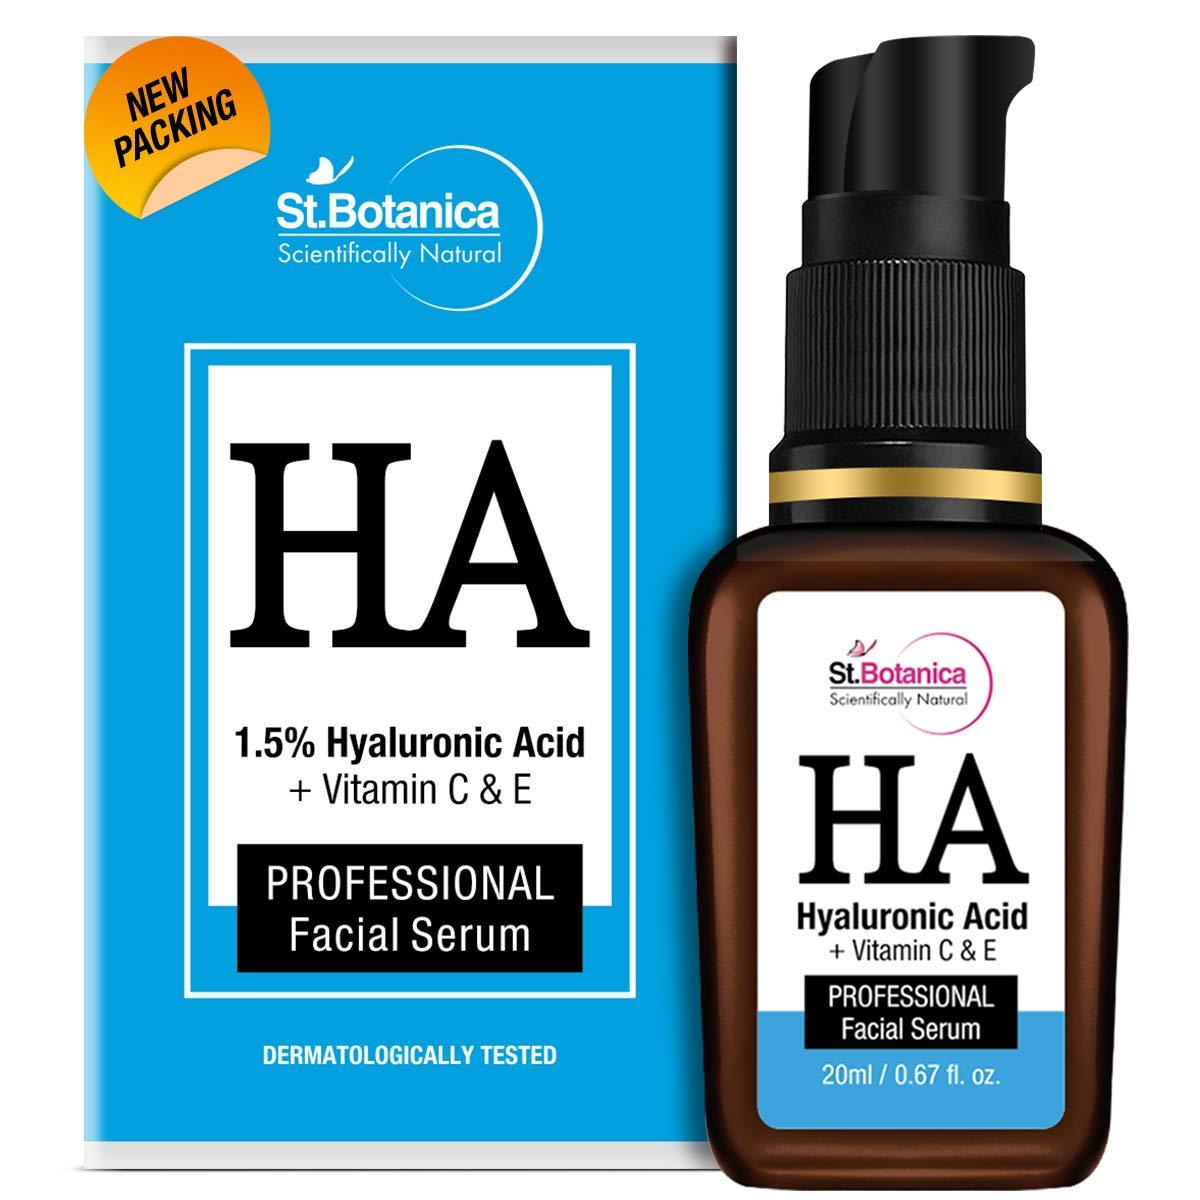 StBotanica Hyaluronic Acid Face Serum + Vitamin C, E - Under Eye Dark Circles, Anti Aging, Skin Fairness Brightening, 20 ml